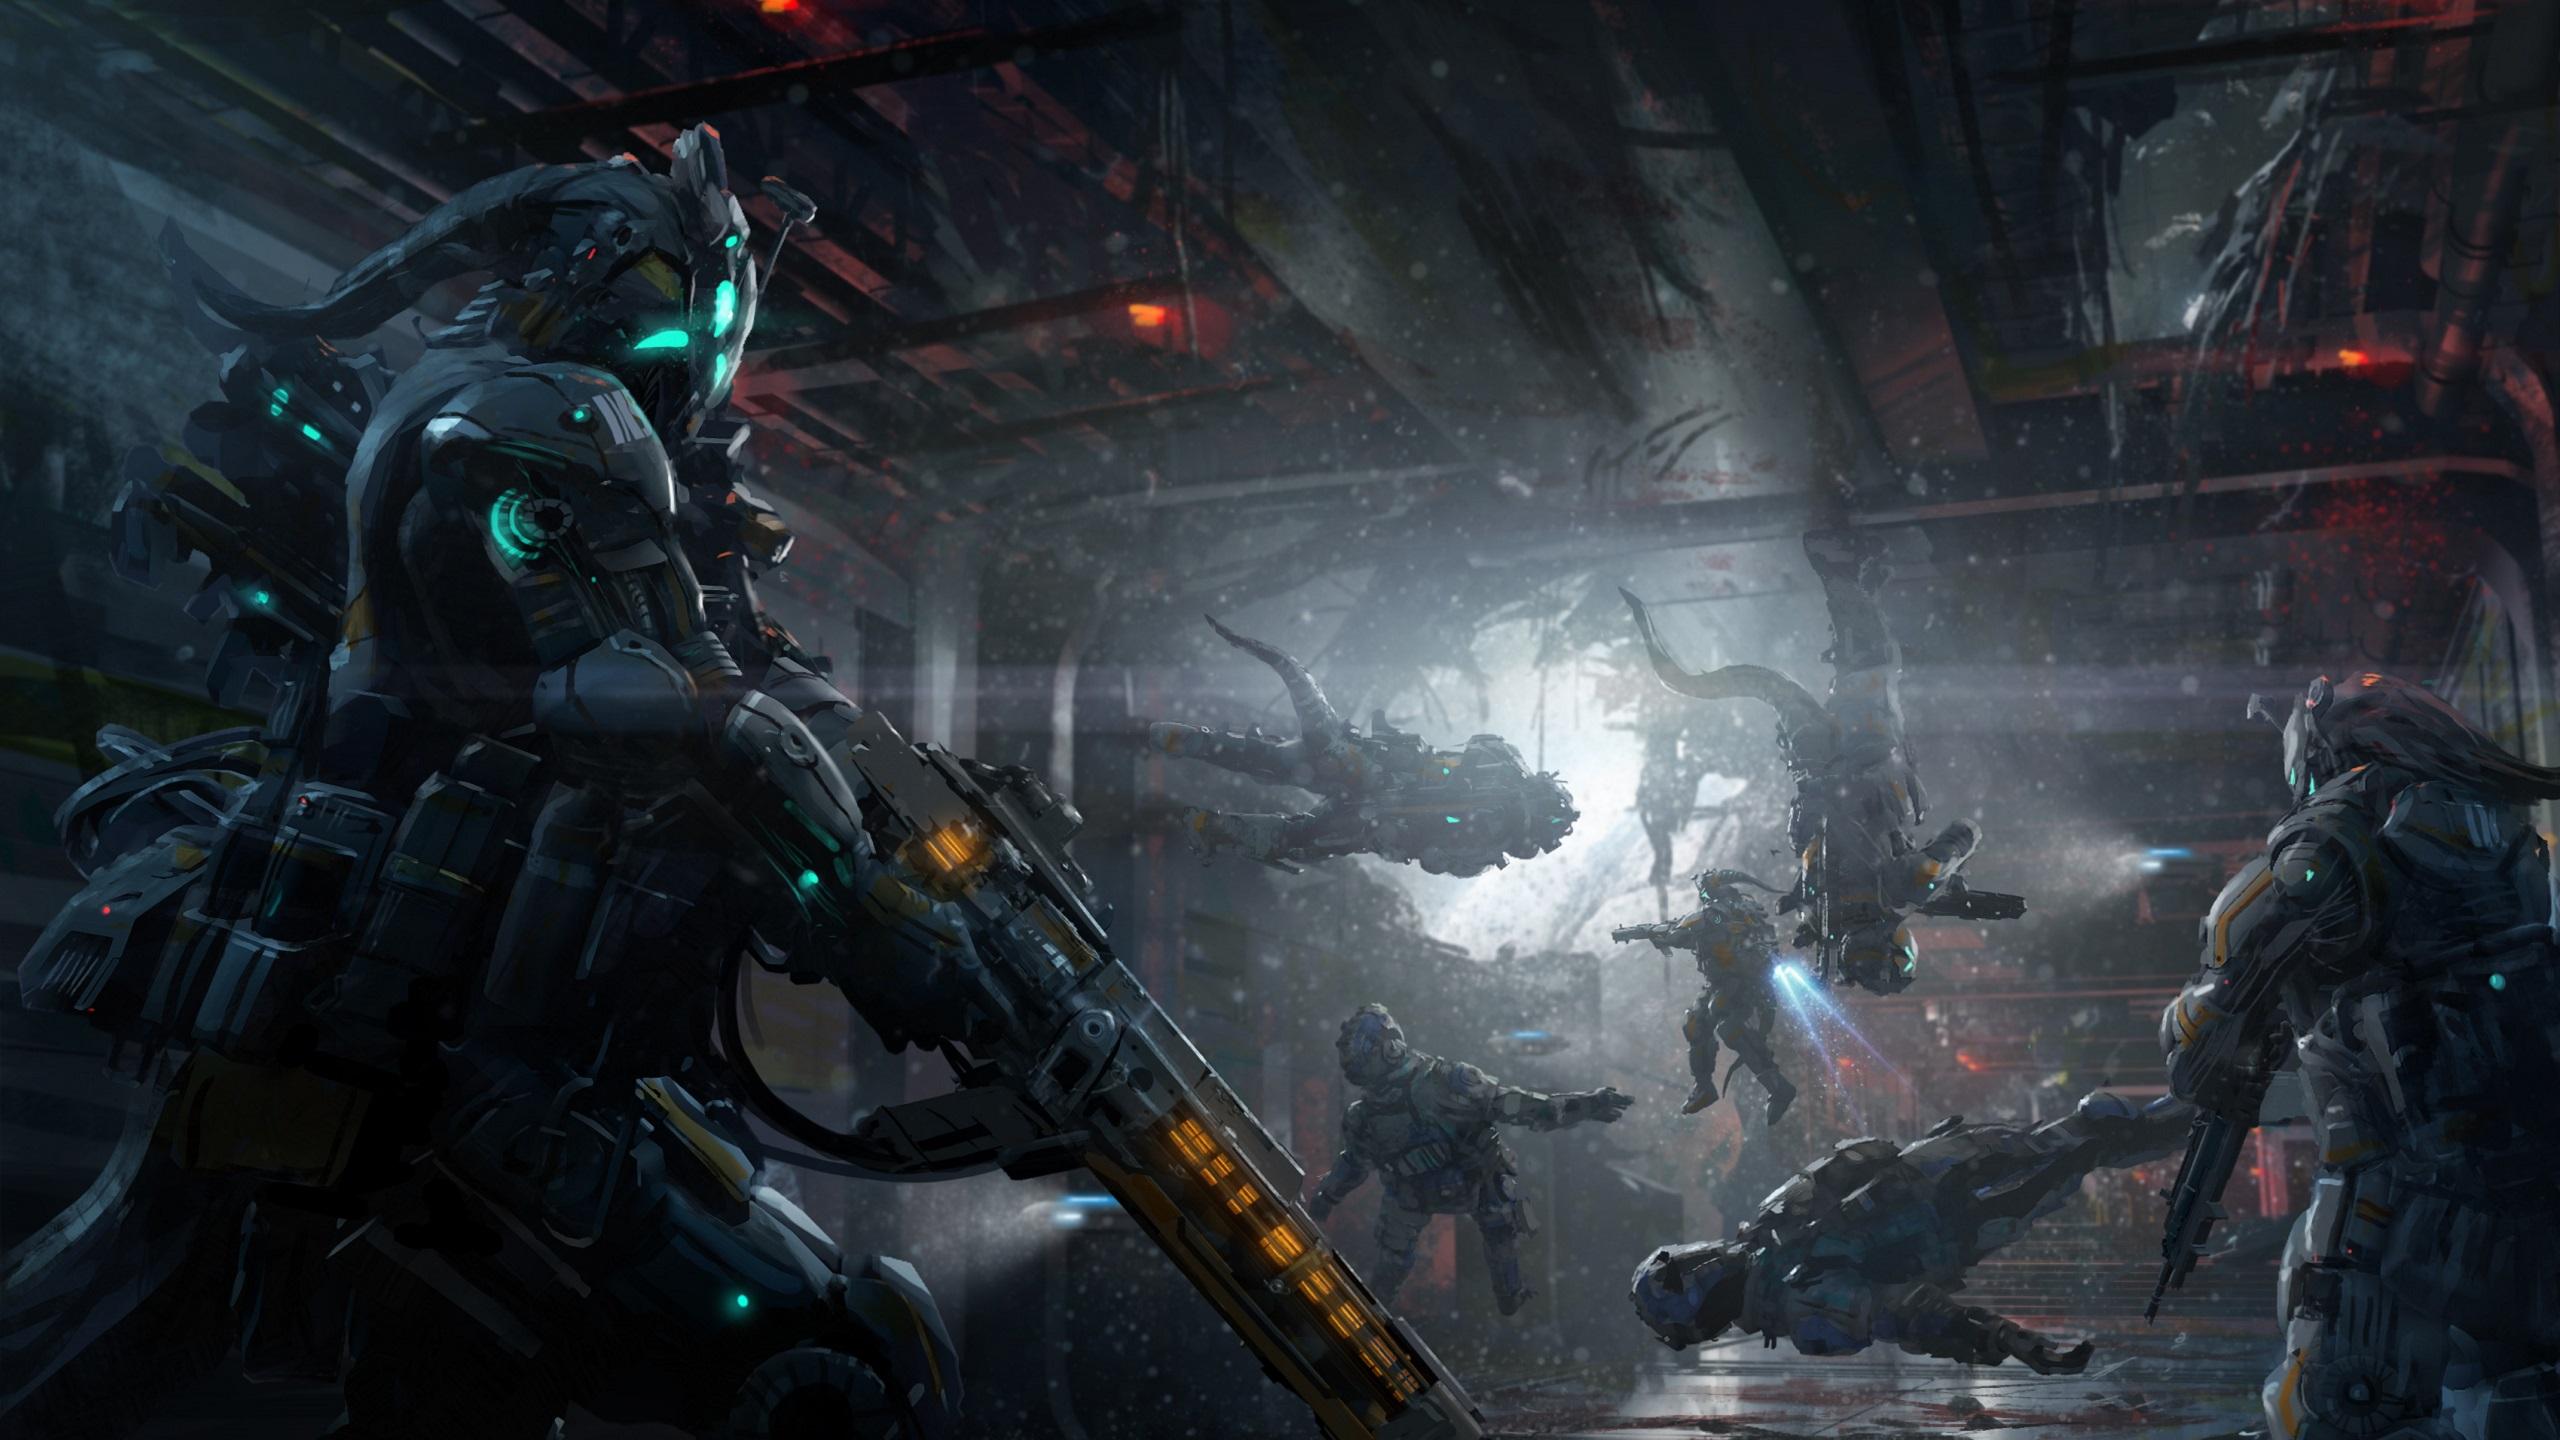 2560x1440 Creature Sci Fi Warrior 1440p Resolution Hd 4k